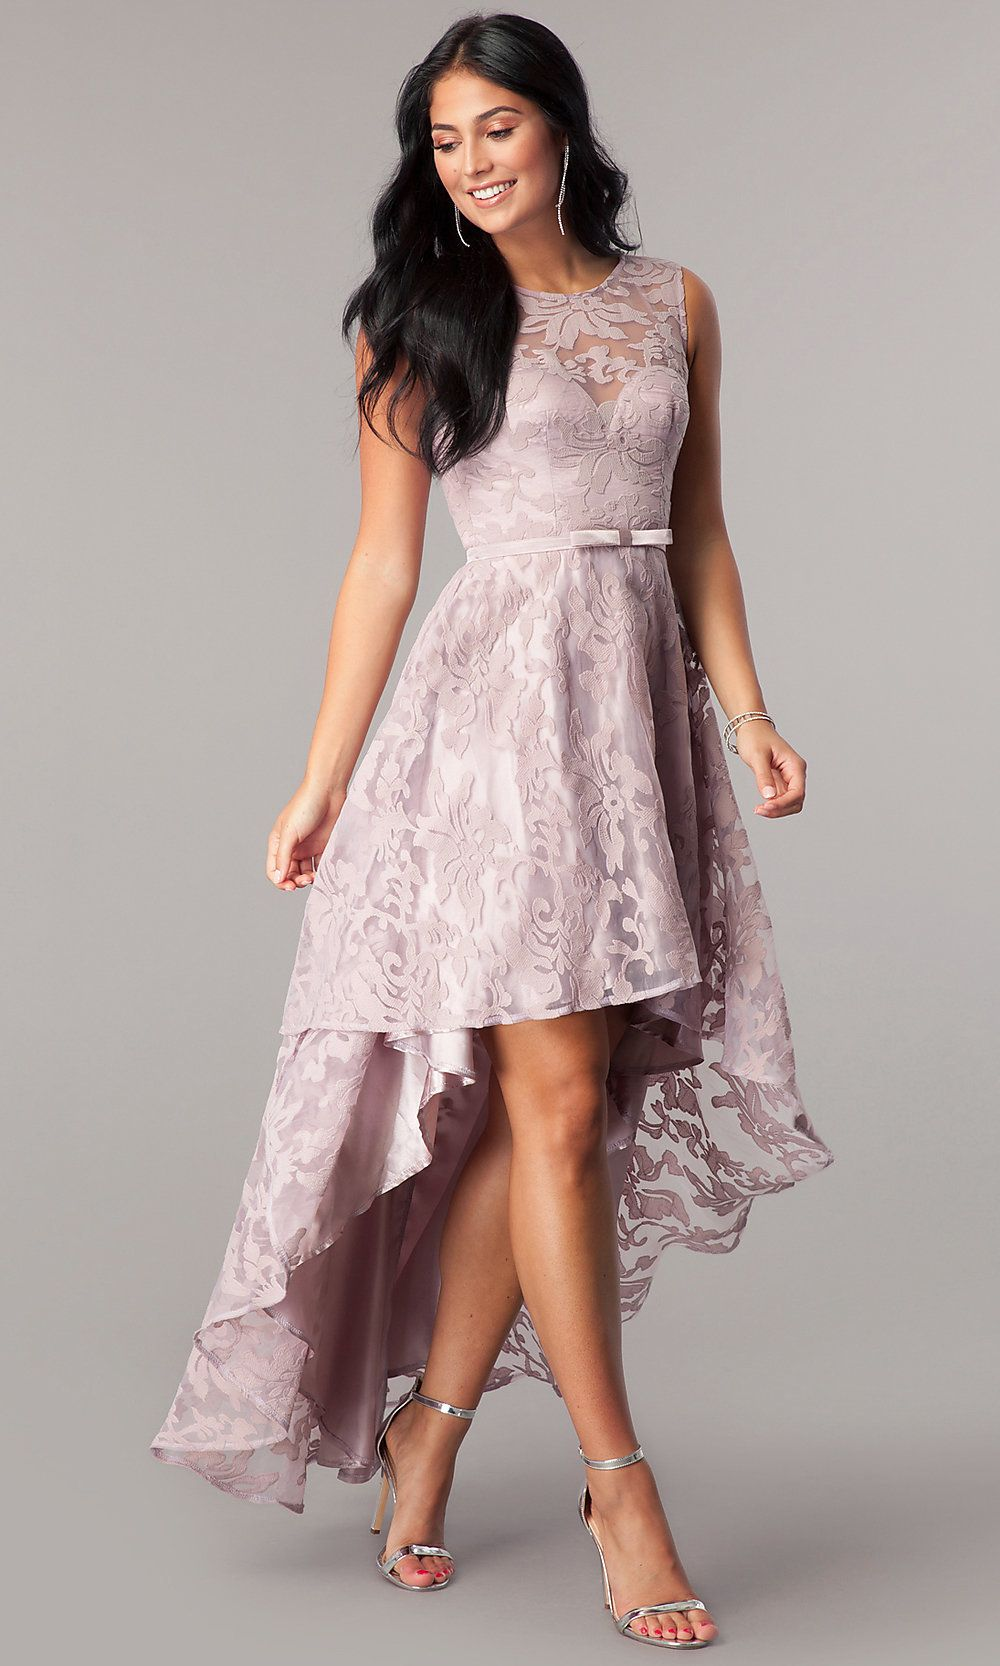 040c2b69a7 Sleeveless High-Low Lace Semi-Formal Dress- PromGirl